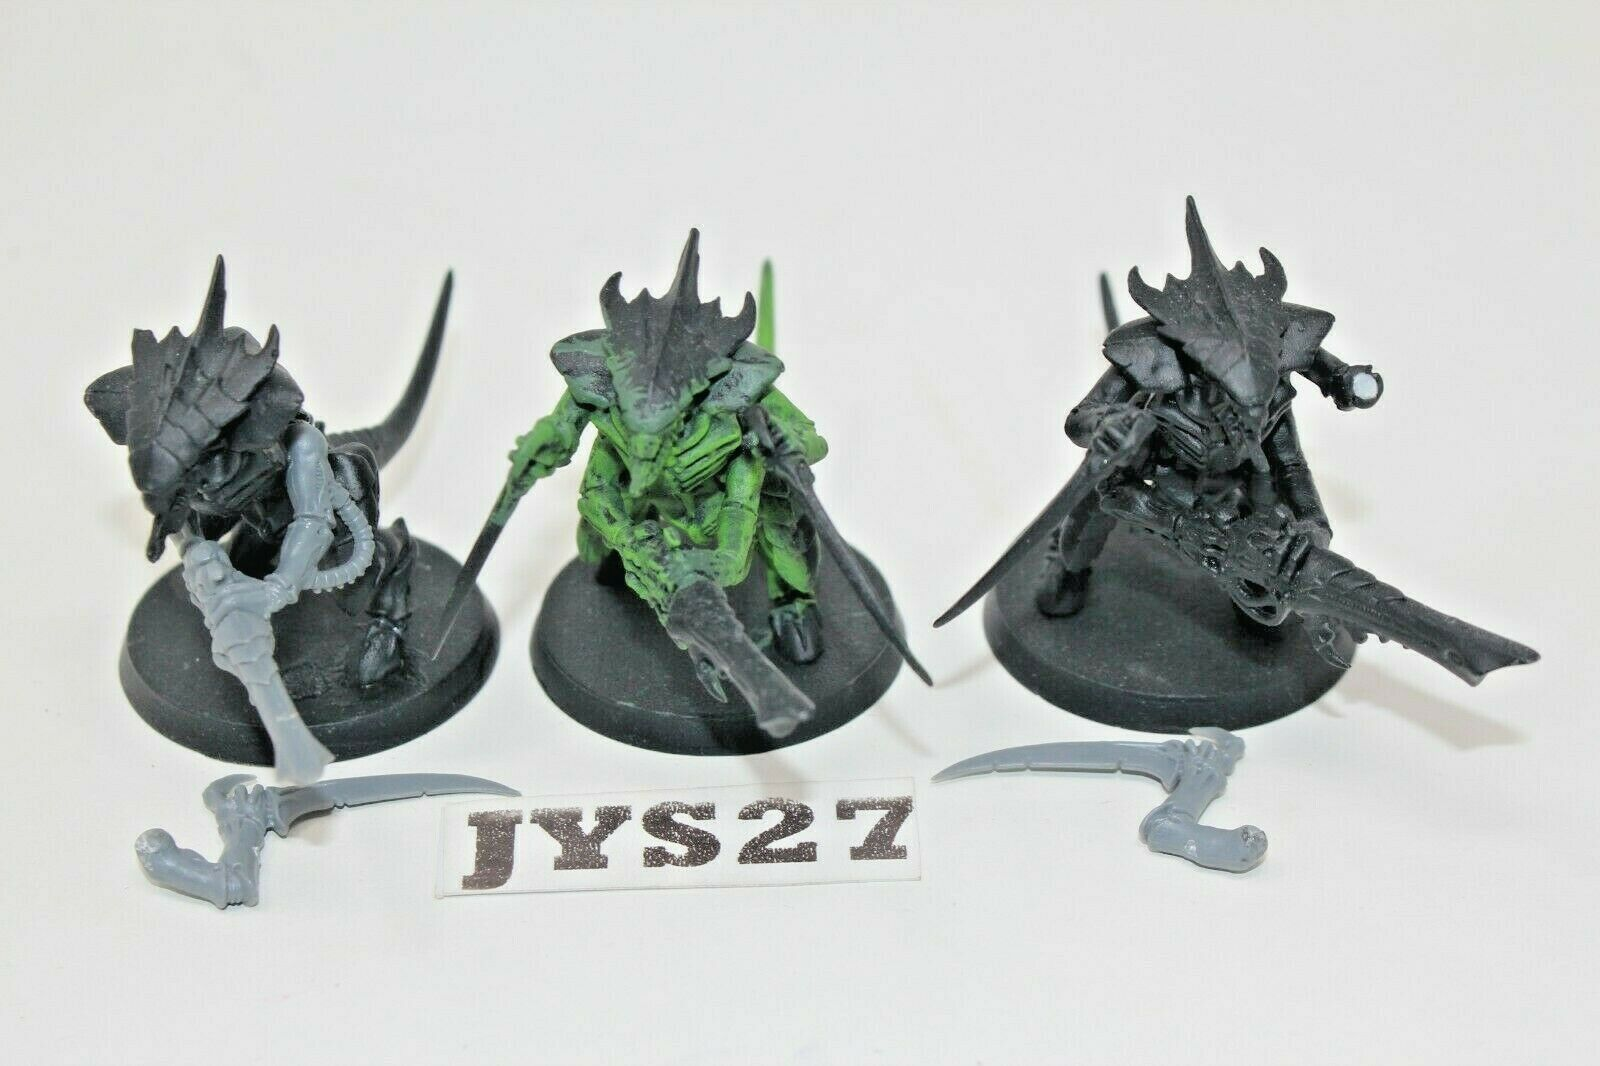 Warhammer Tyranids Tyranids Tyranids Warriors Incomplete - JYS27